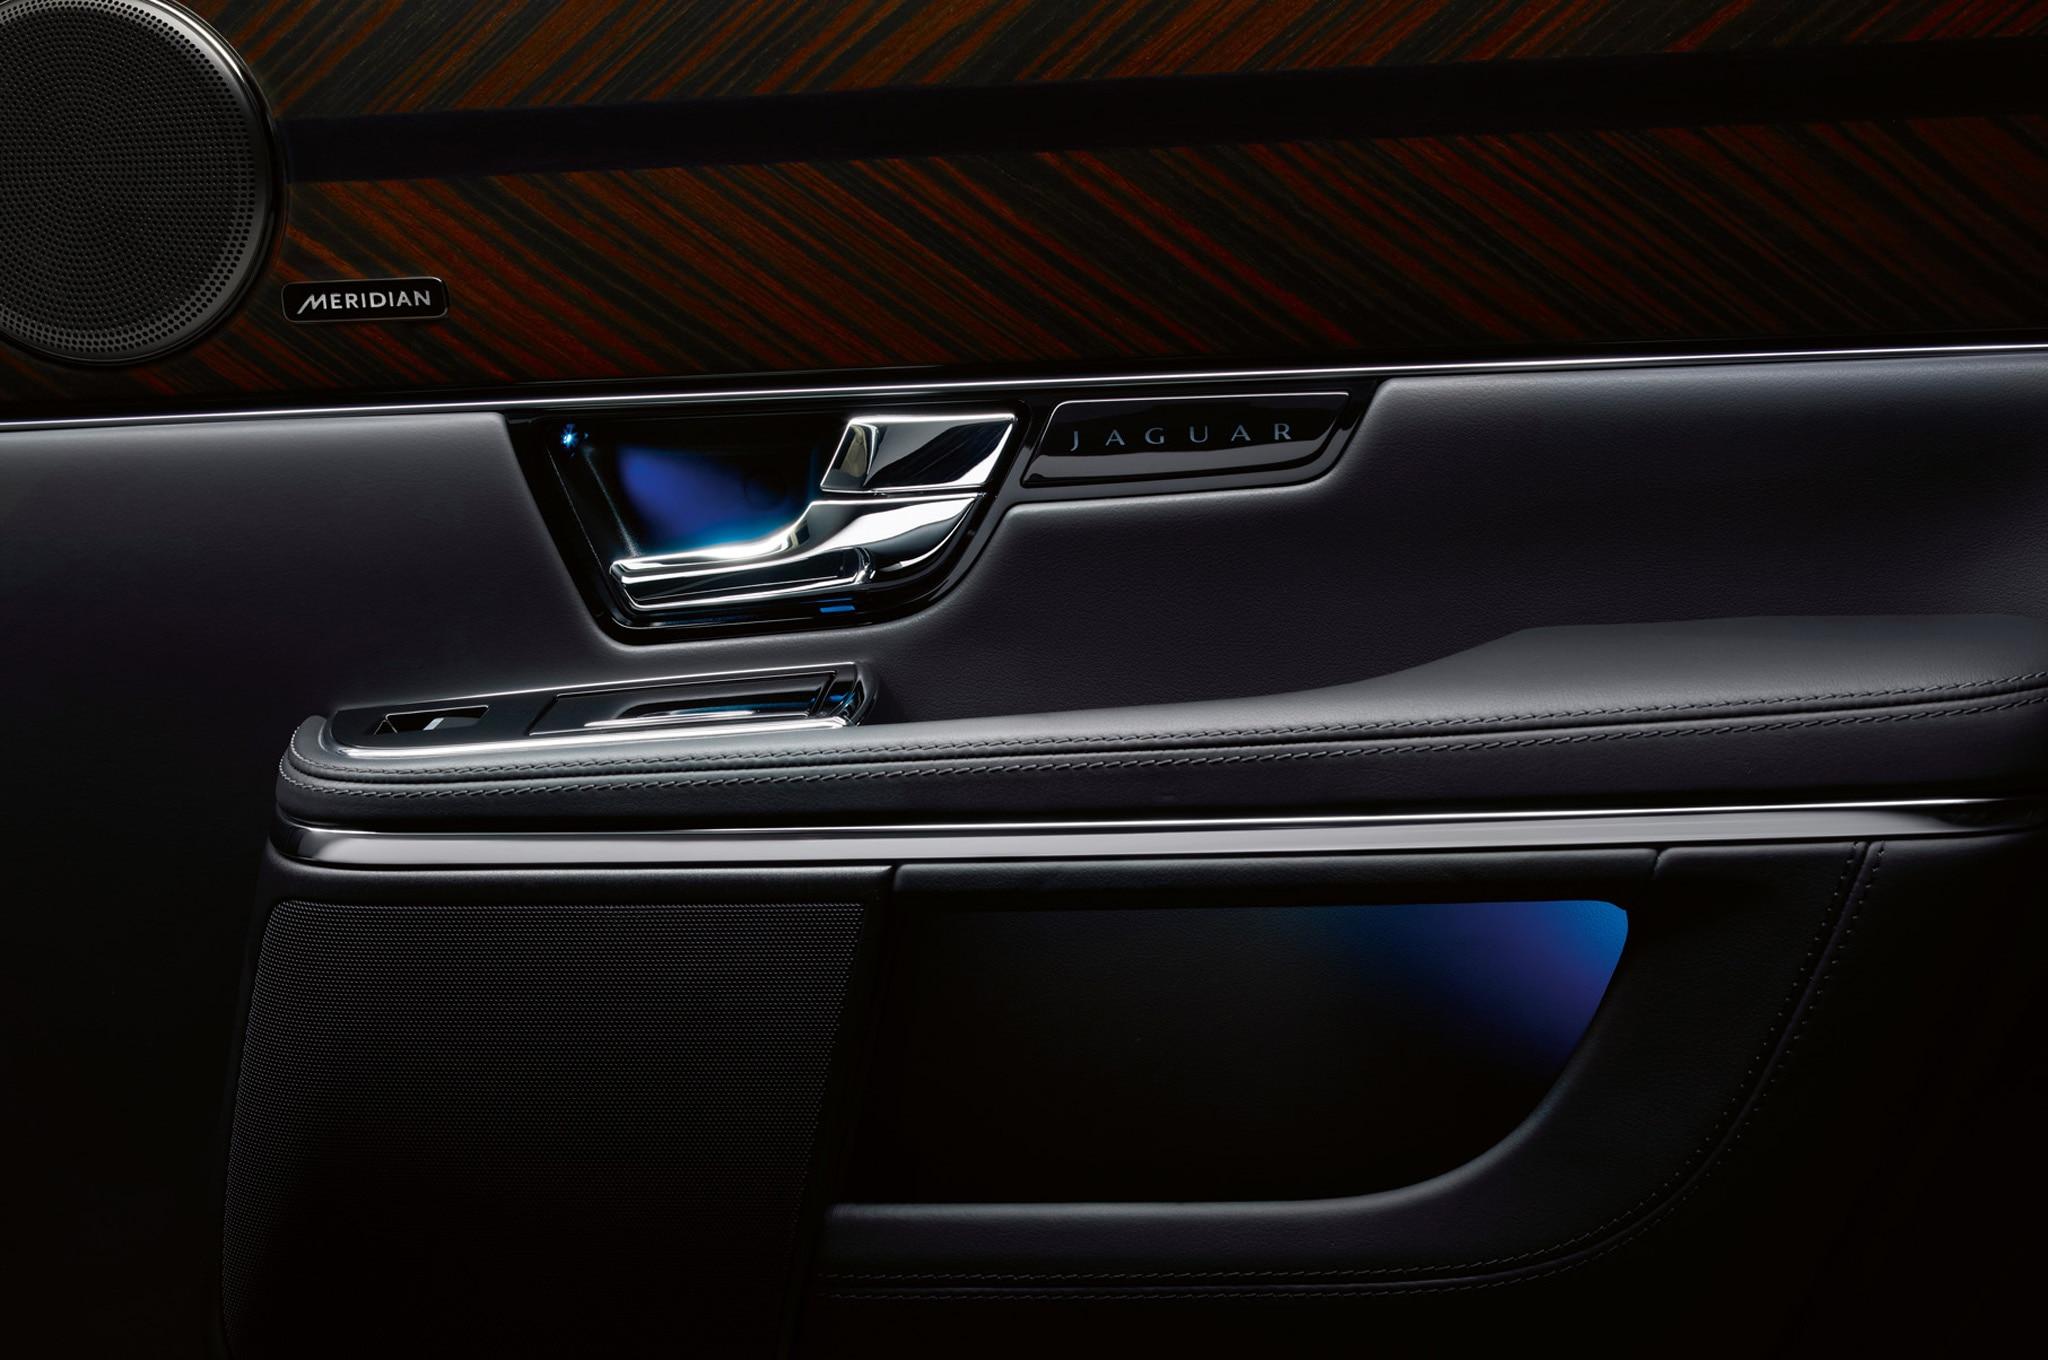 2013 jaguar xj 3 0 awd driven automobile magazine. Black Bedroom Furniture Sets. Home Design Ideas